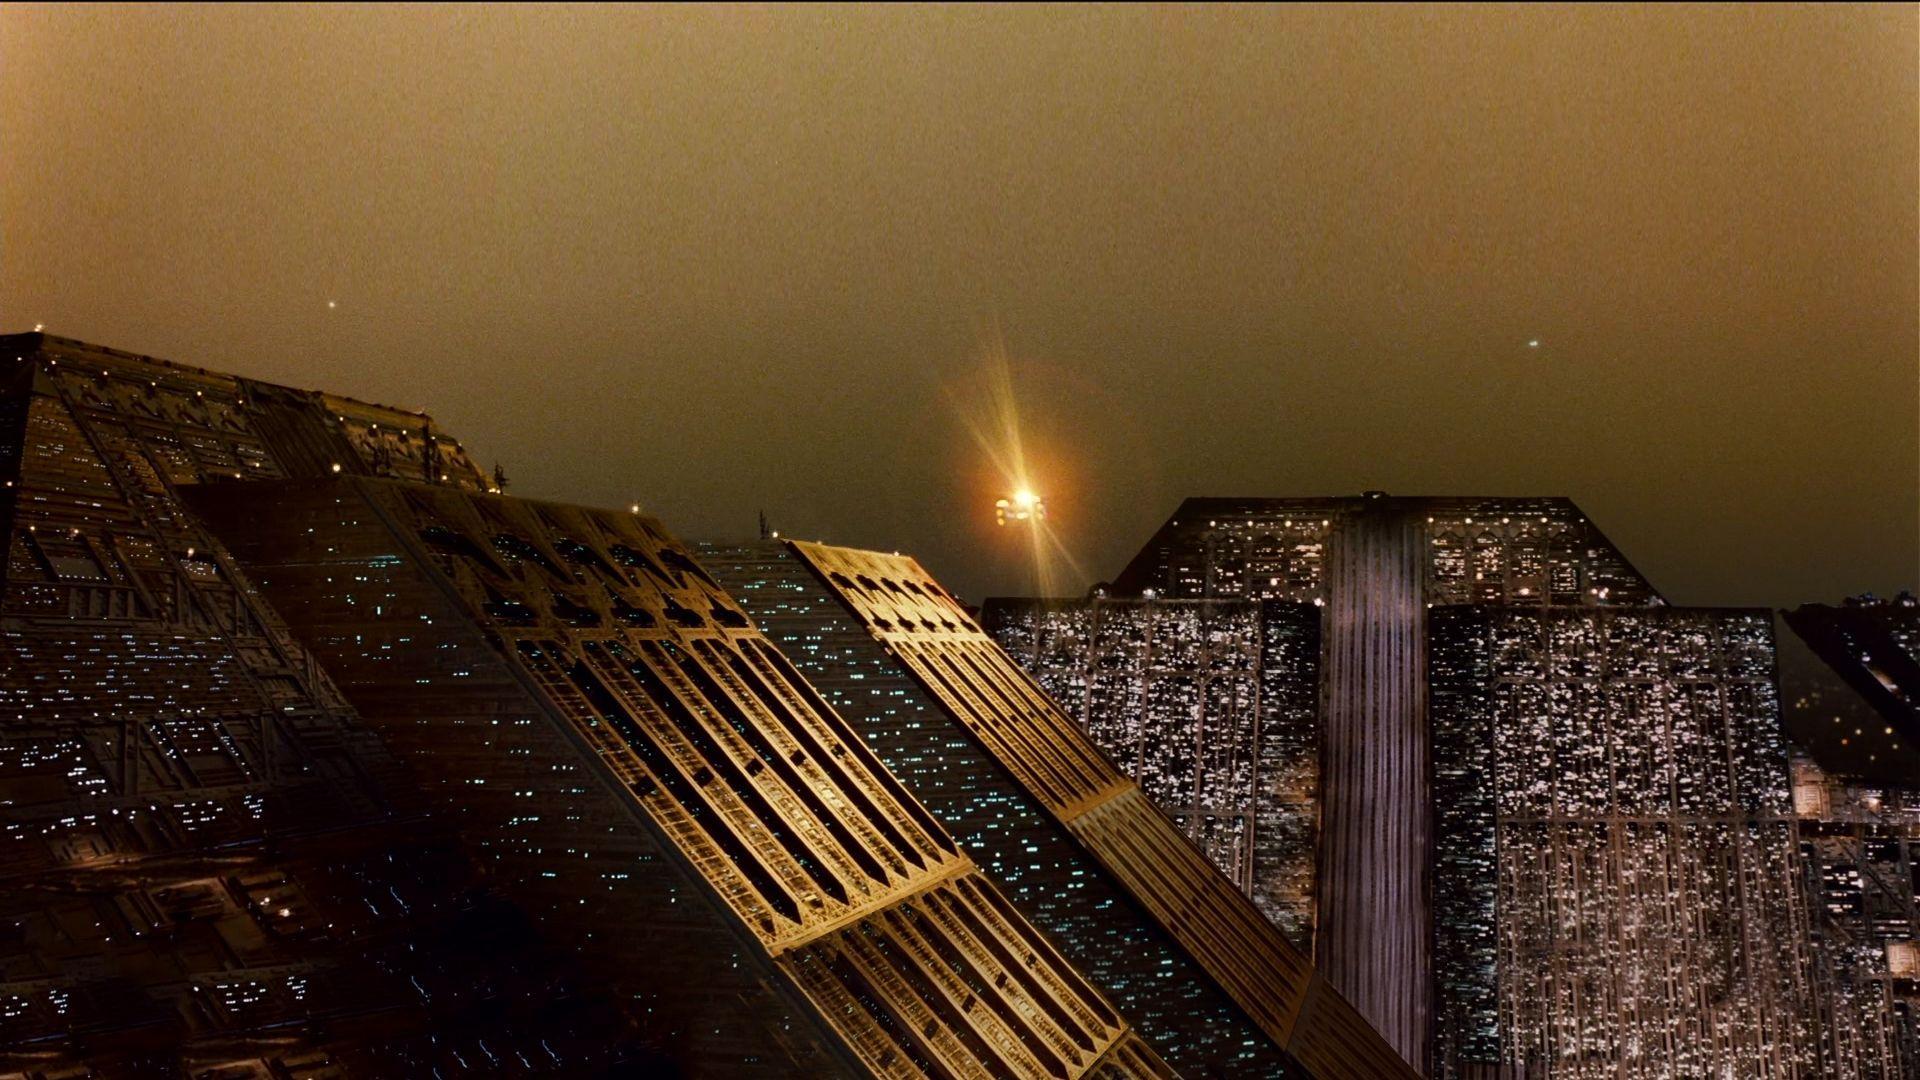 Blade Runner City Wallpapers - Top Free Blade Runner City ...